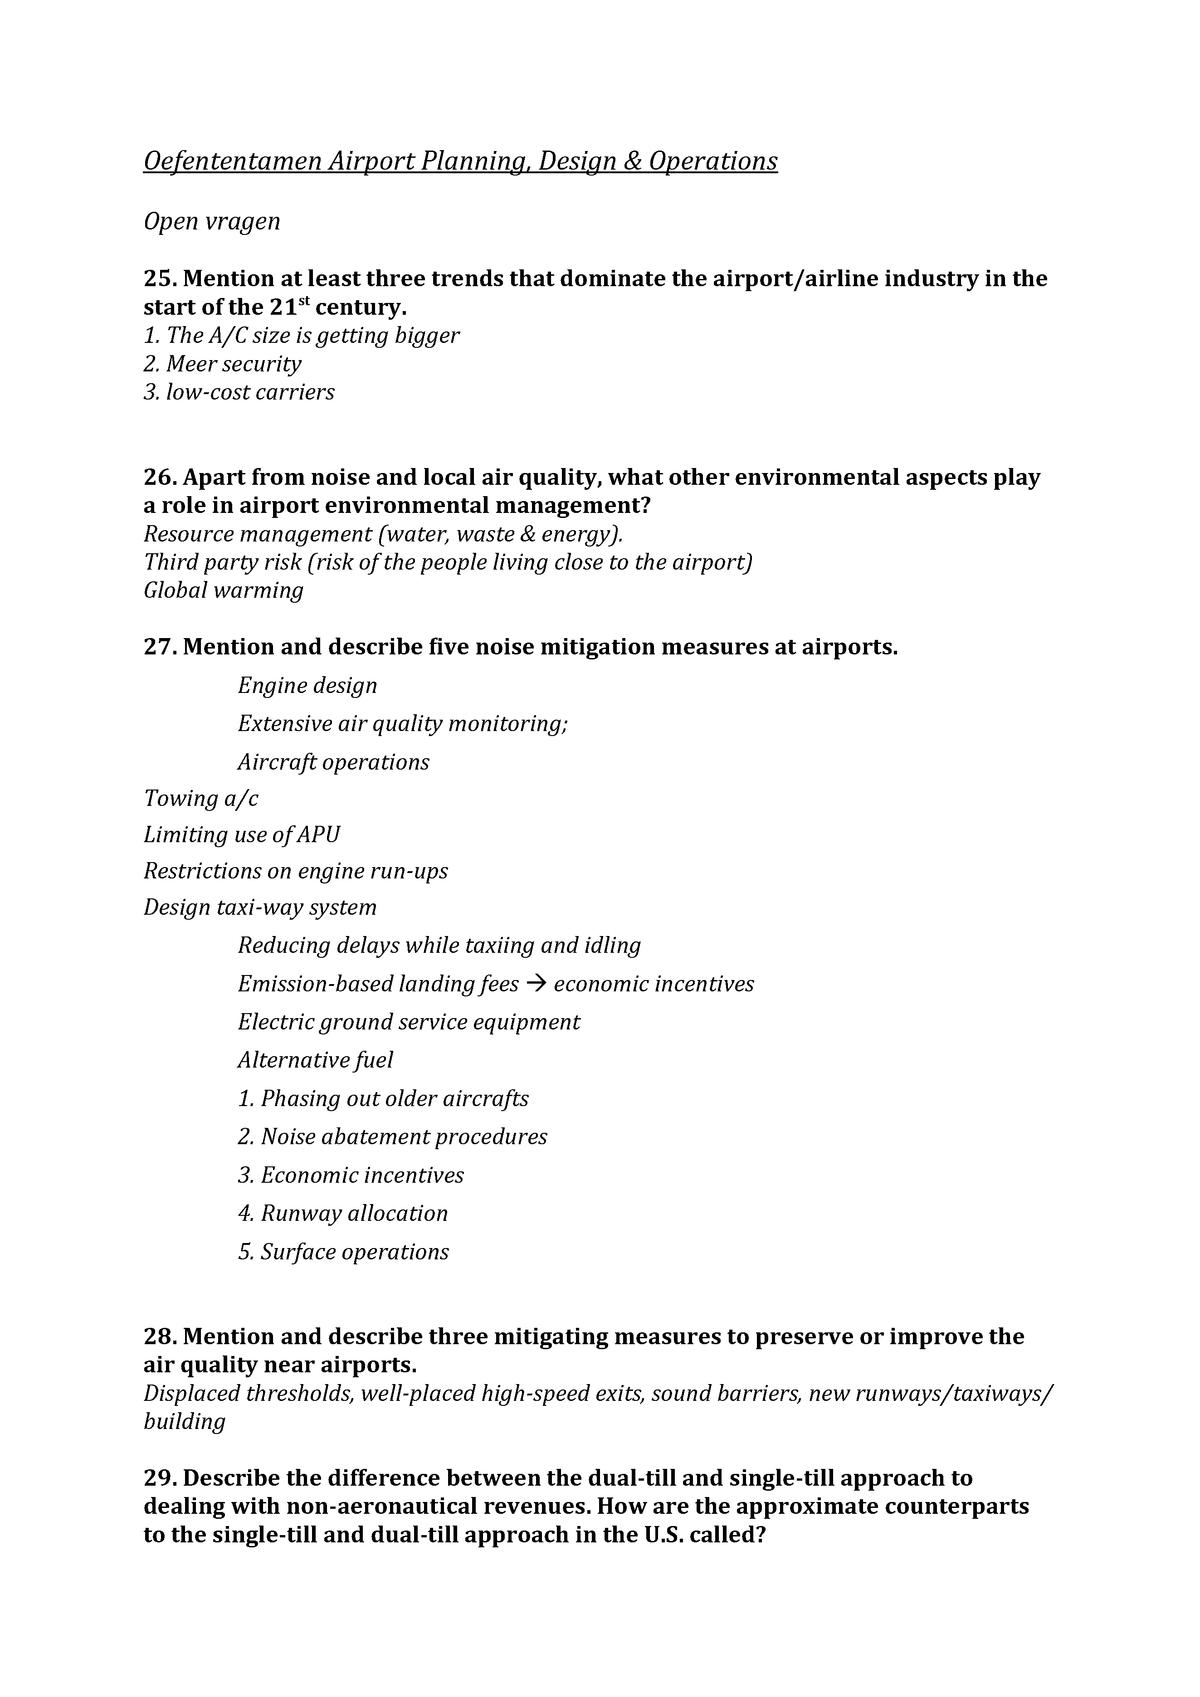 Oefententamen Airport Planning - AE3502-14: Airport Planning, Design